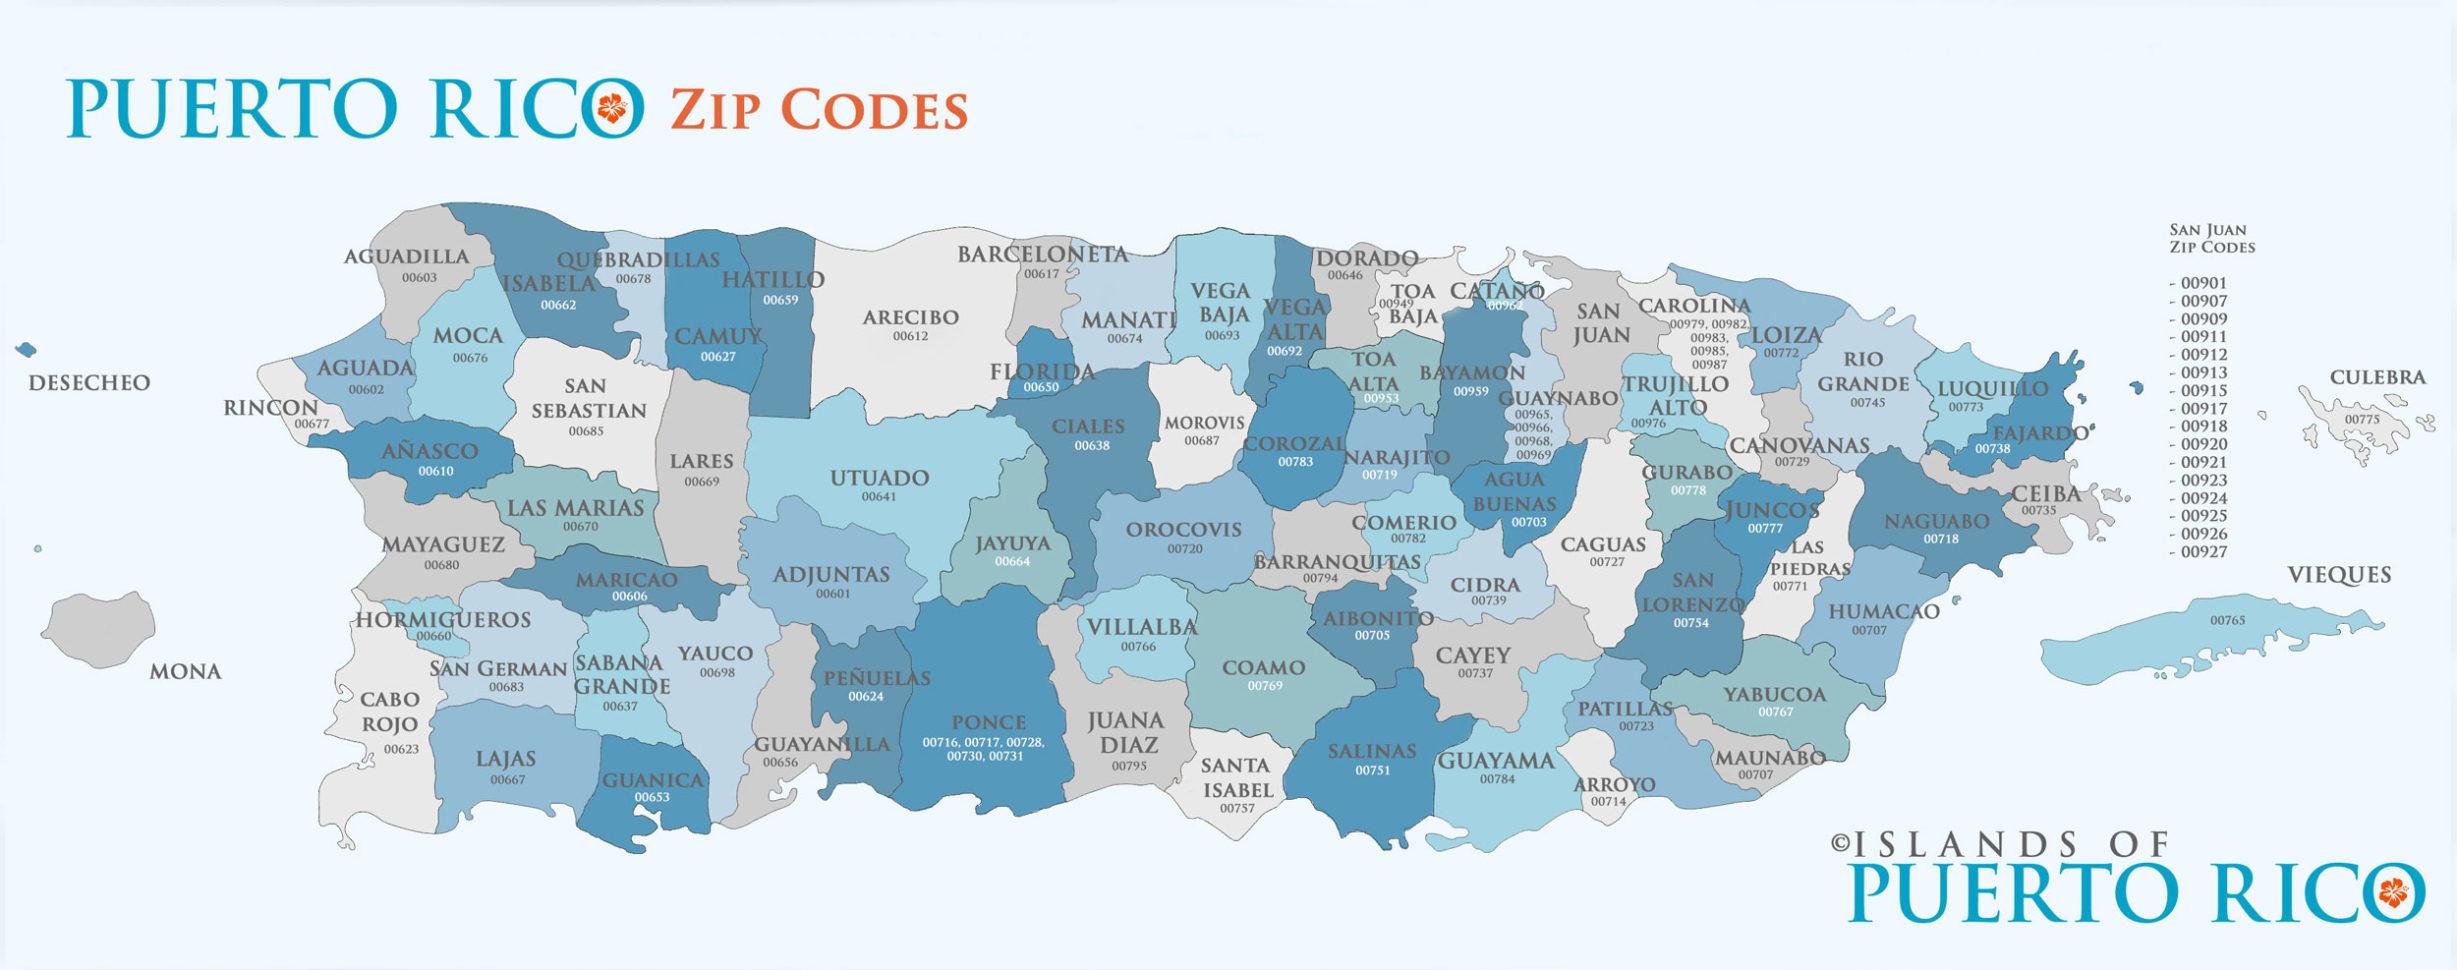 area code spreadsheet  Area Code Spreadsheet Within Puerto Rico Zip Code  Area Code List  Easy To Use Puerto Rico Zip Area Code Spreadsheet Printable Spreadshee